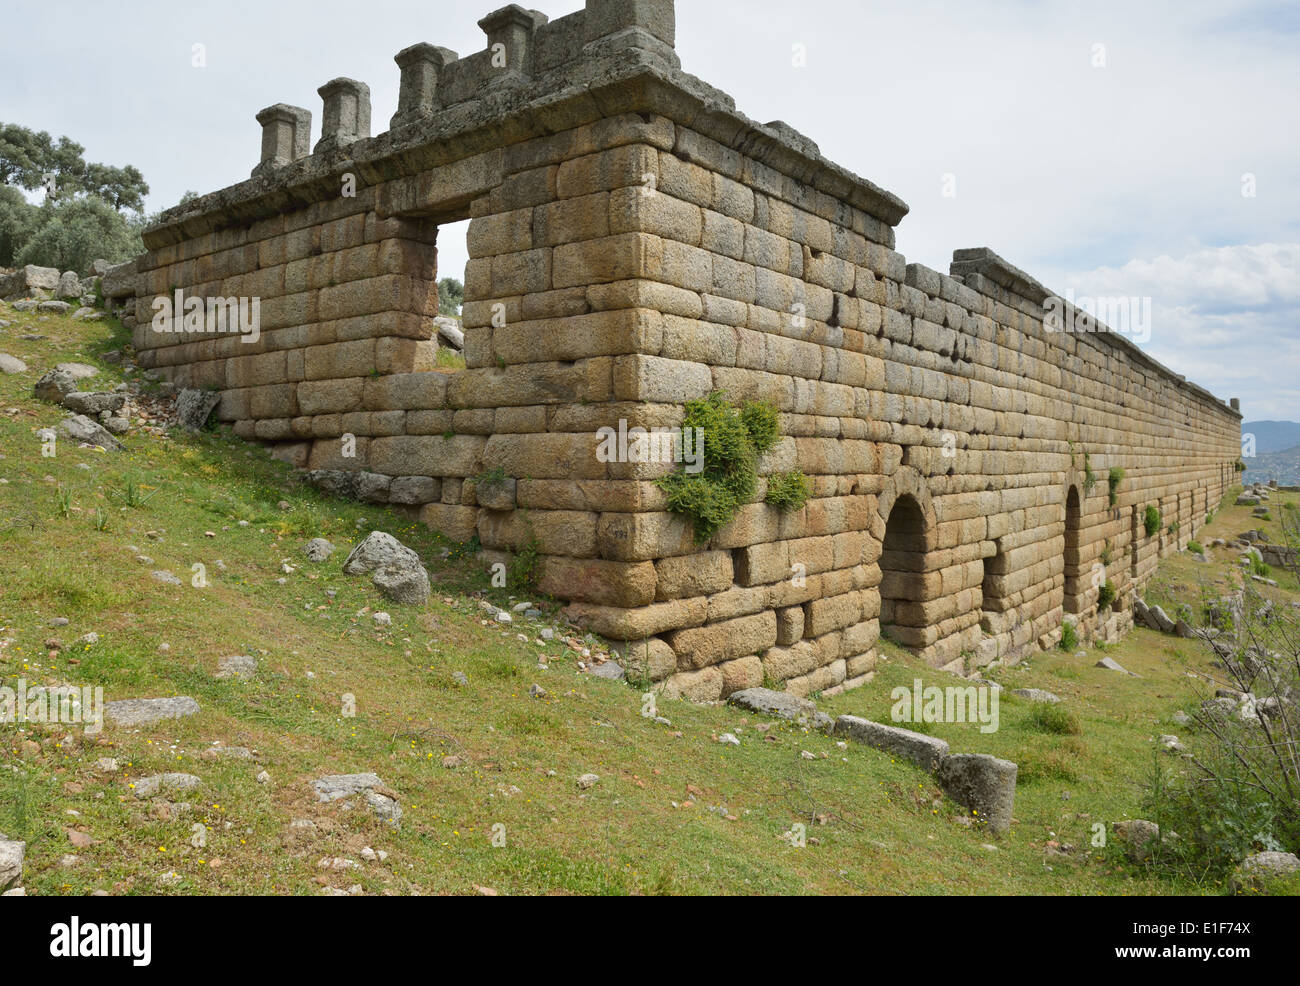 Three-story Hellenistic stoa, Alinda, Turkey 140416_60816 - Stock Image